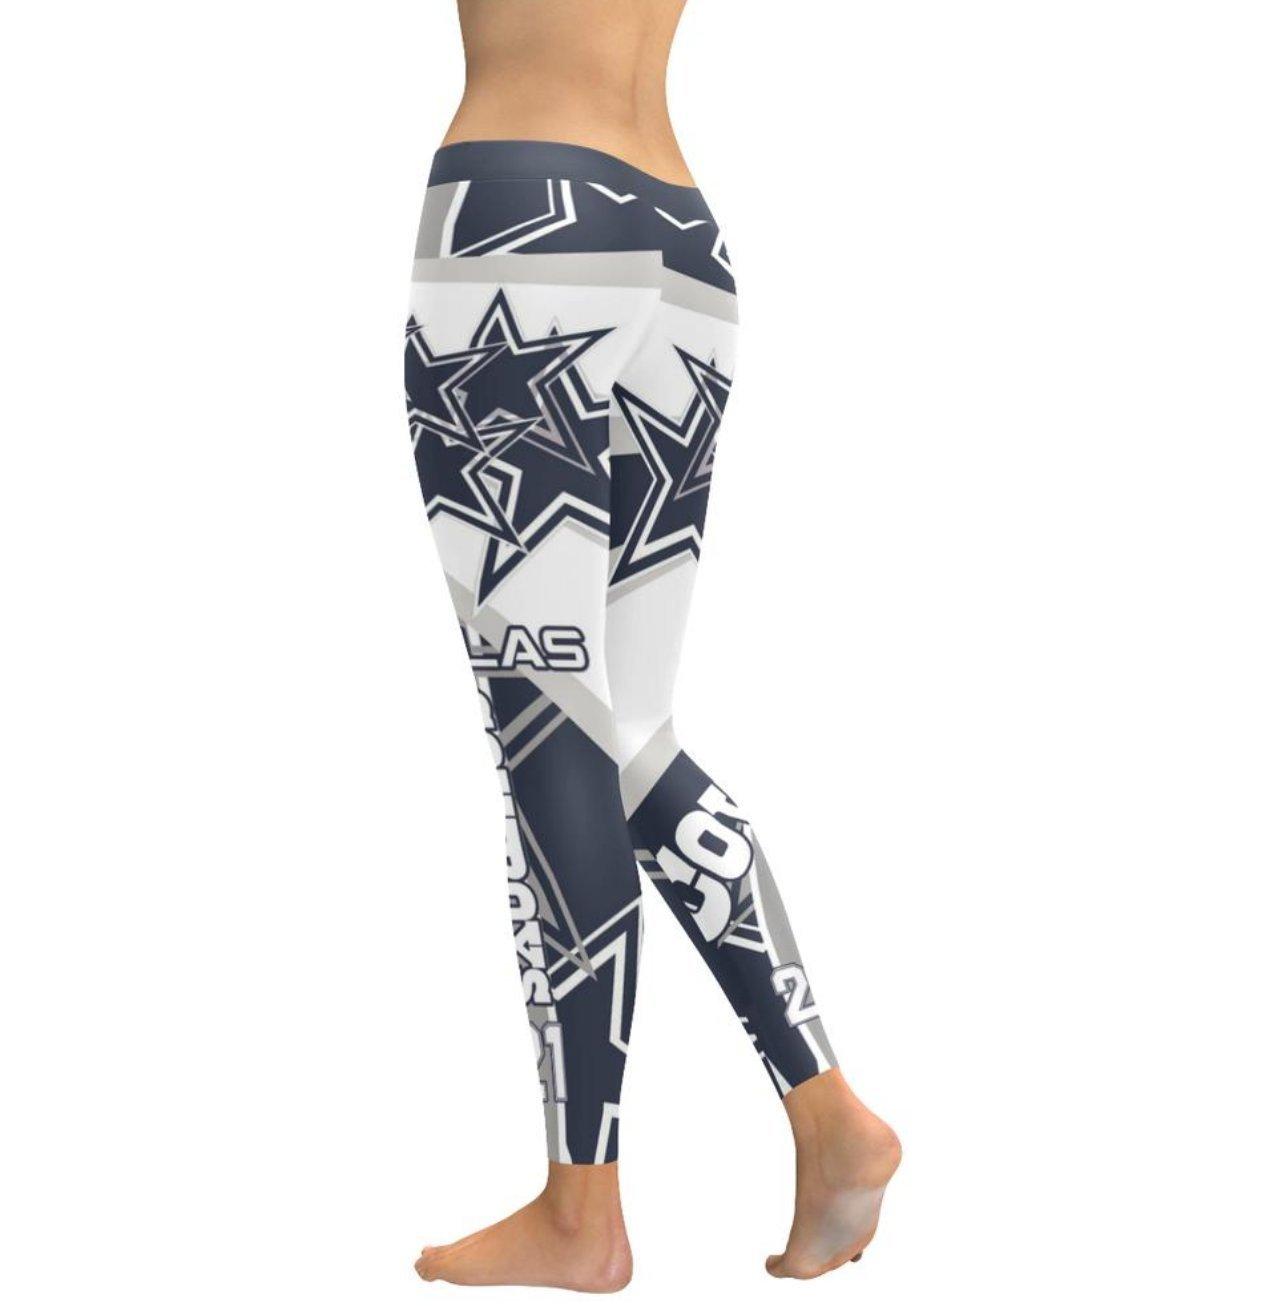 73db389fb9fce6 Get Quotations · Dallas Football Team Gradient Leggings Women's Tights ✓  Dallas Football Team Stars Graphic Design Print ✓